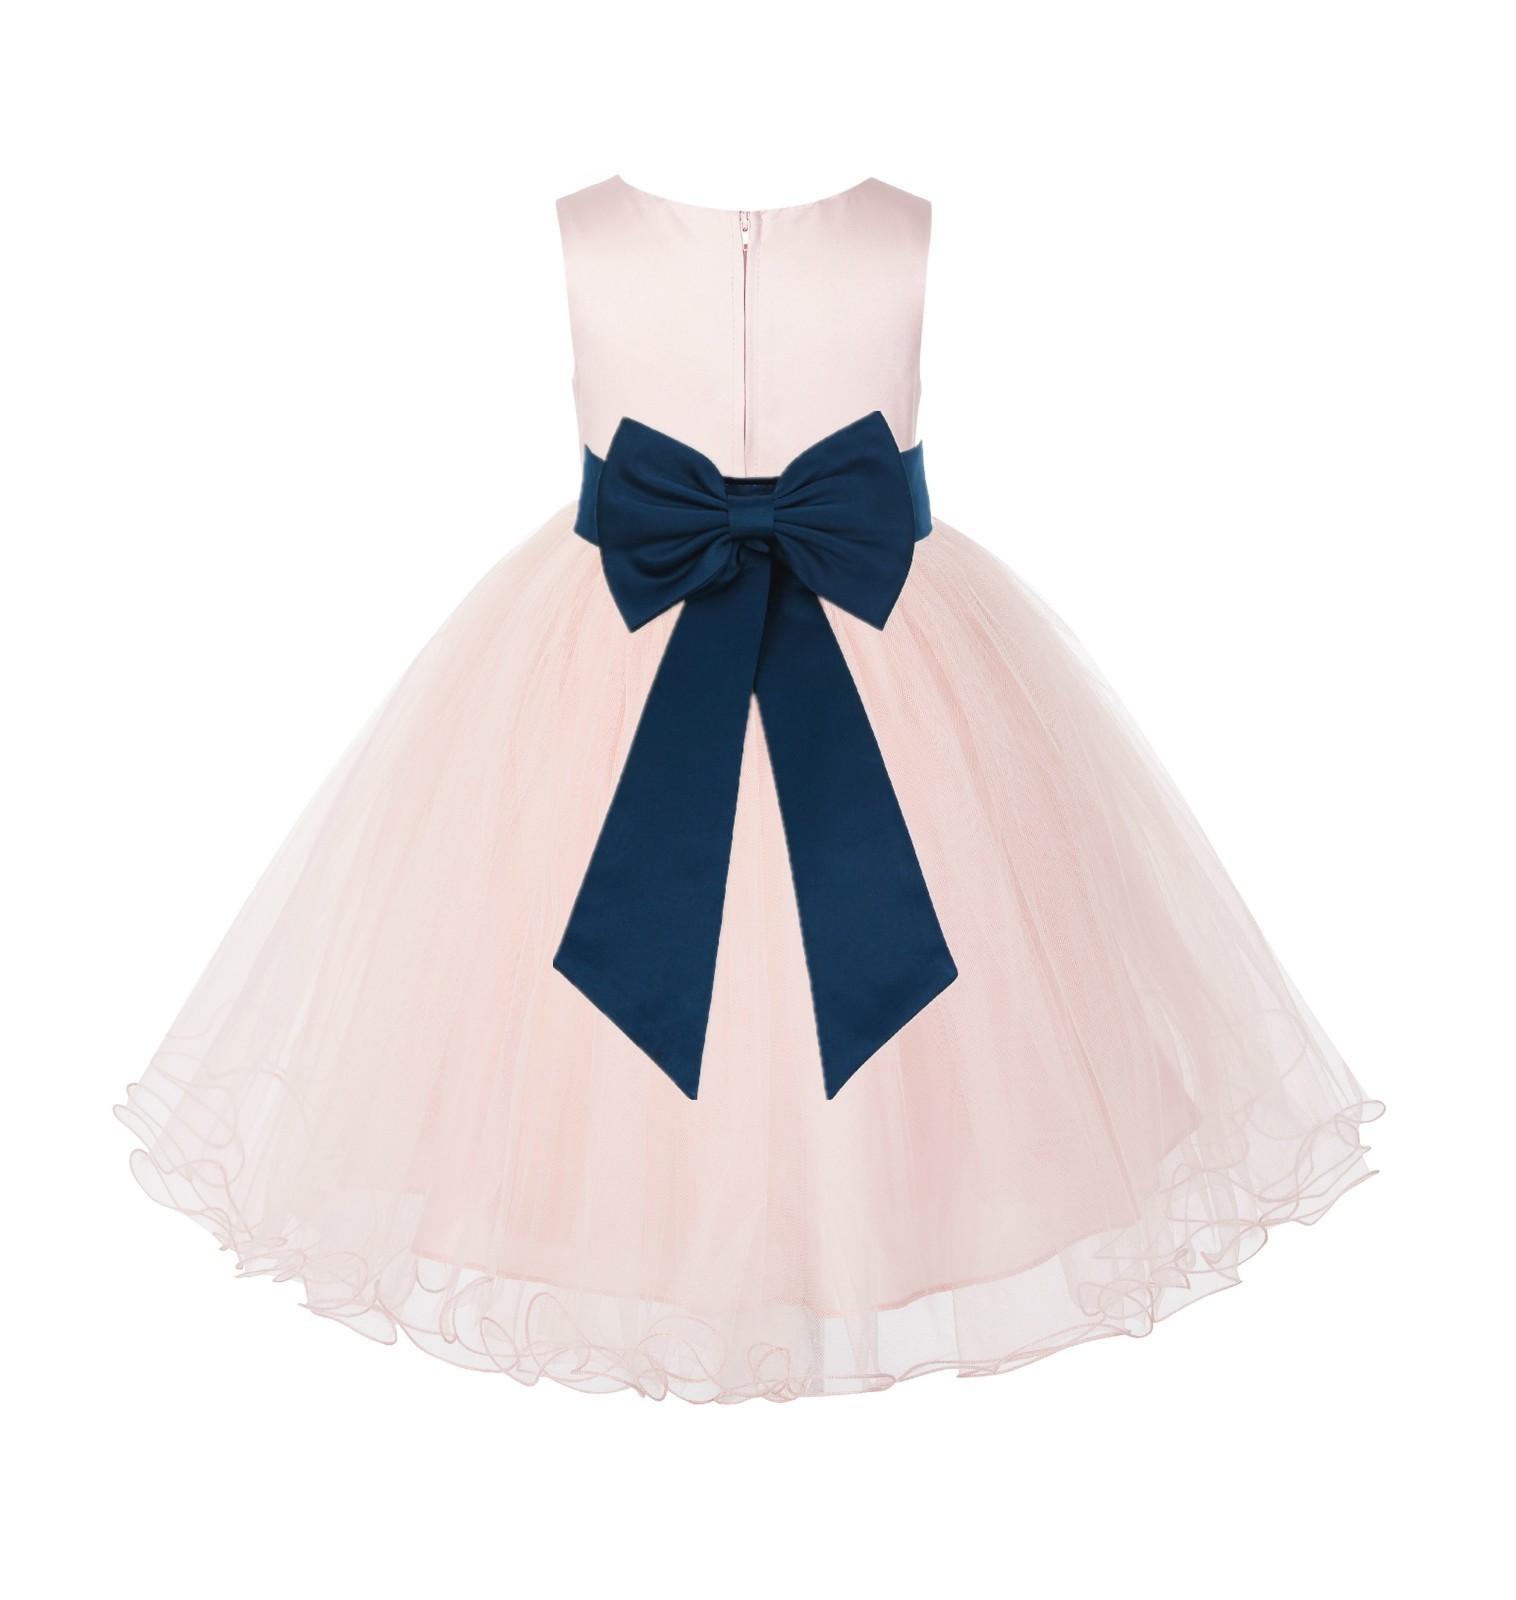 Blush PInk / Peacock Tulle Rattail Edge Flower Girl Dress Wedding Bridesmaid 829T